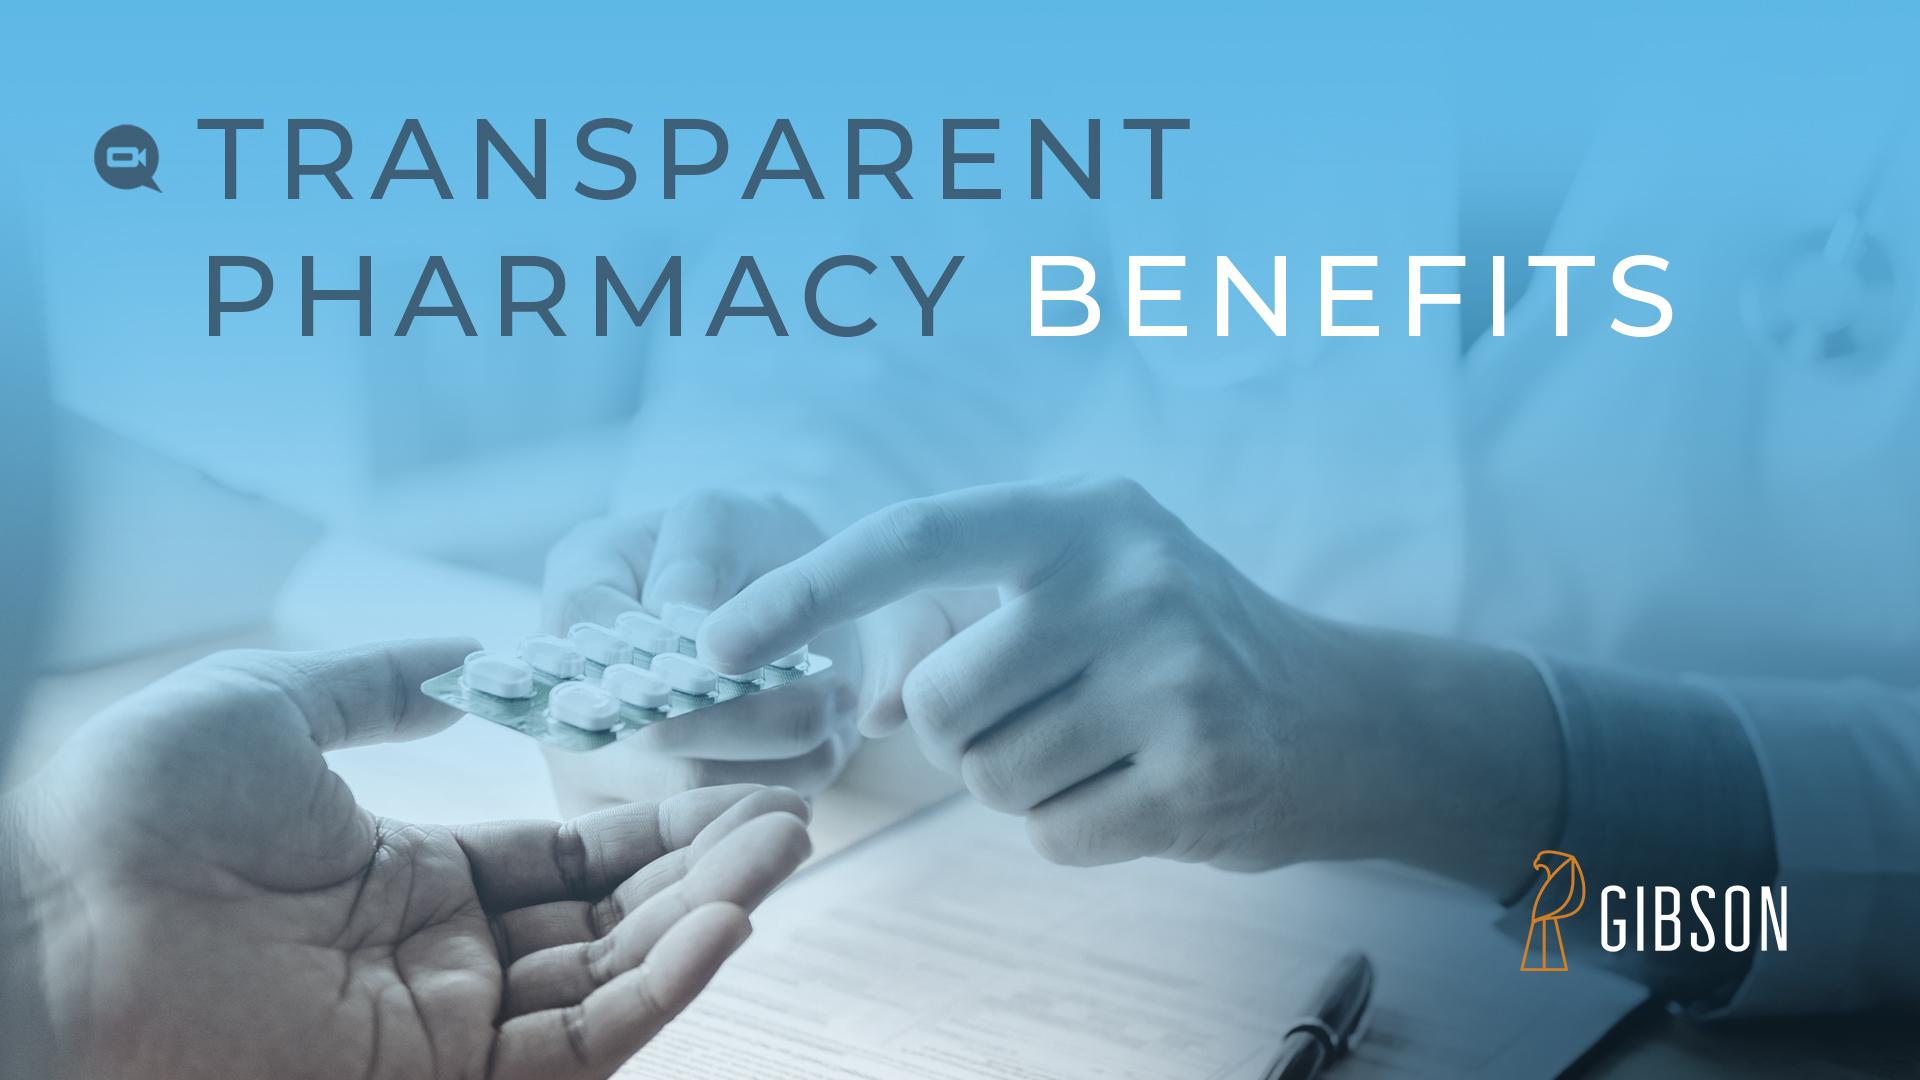 Transparent Pharmacy Benefits